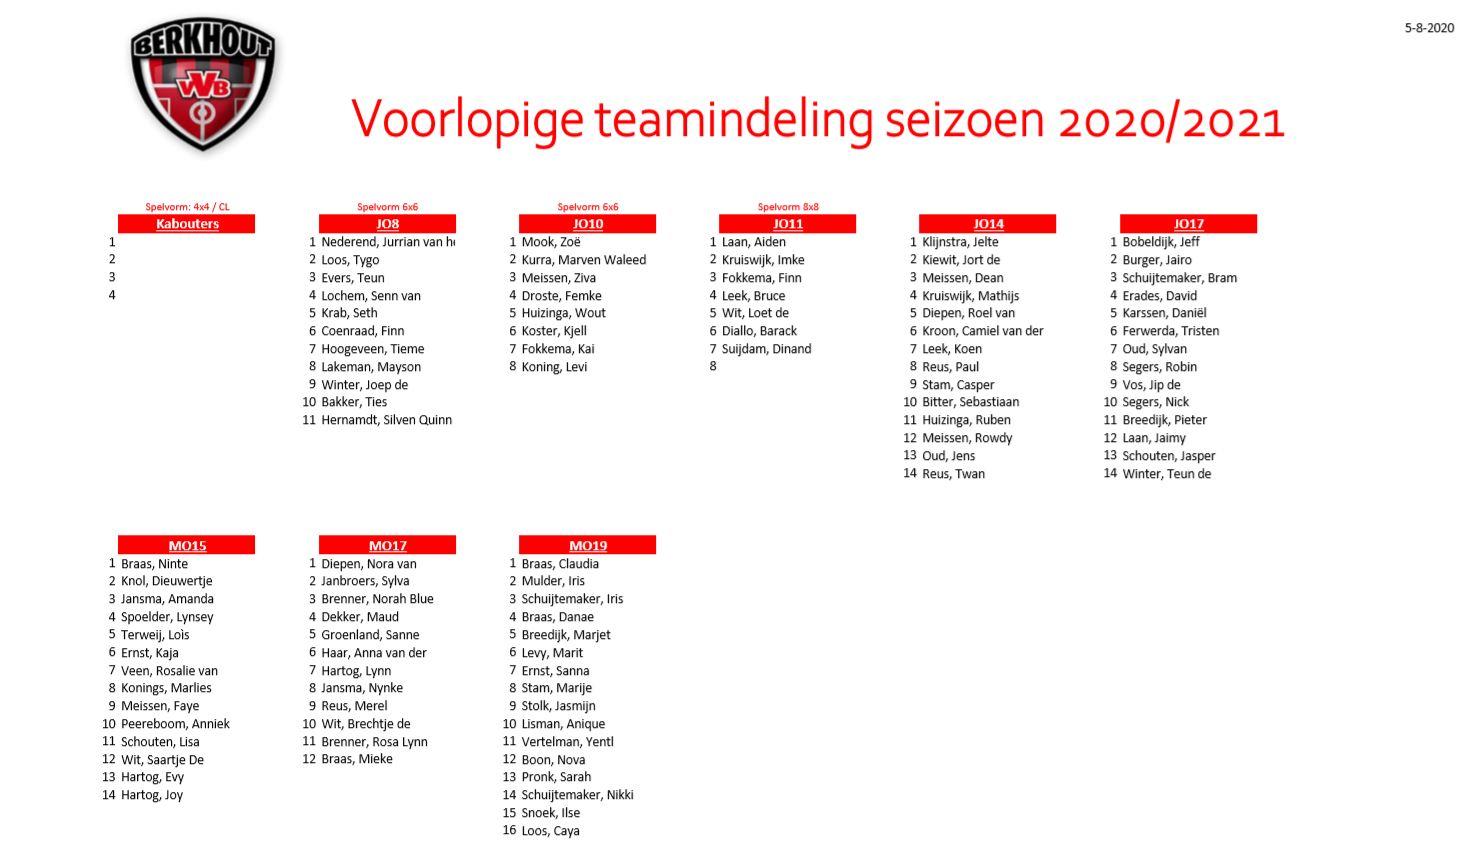 Voorlopige teamindeling seizoen 2020-2021